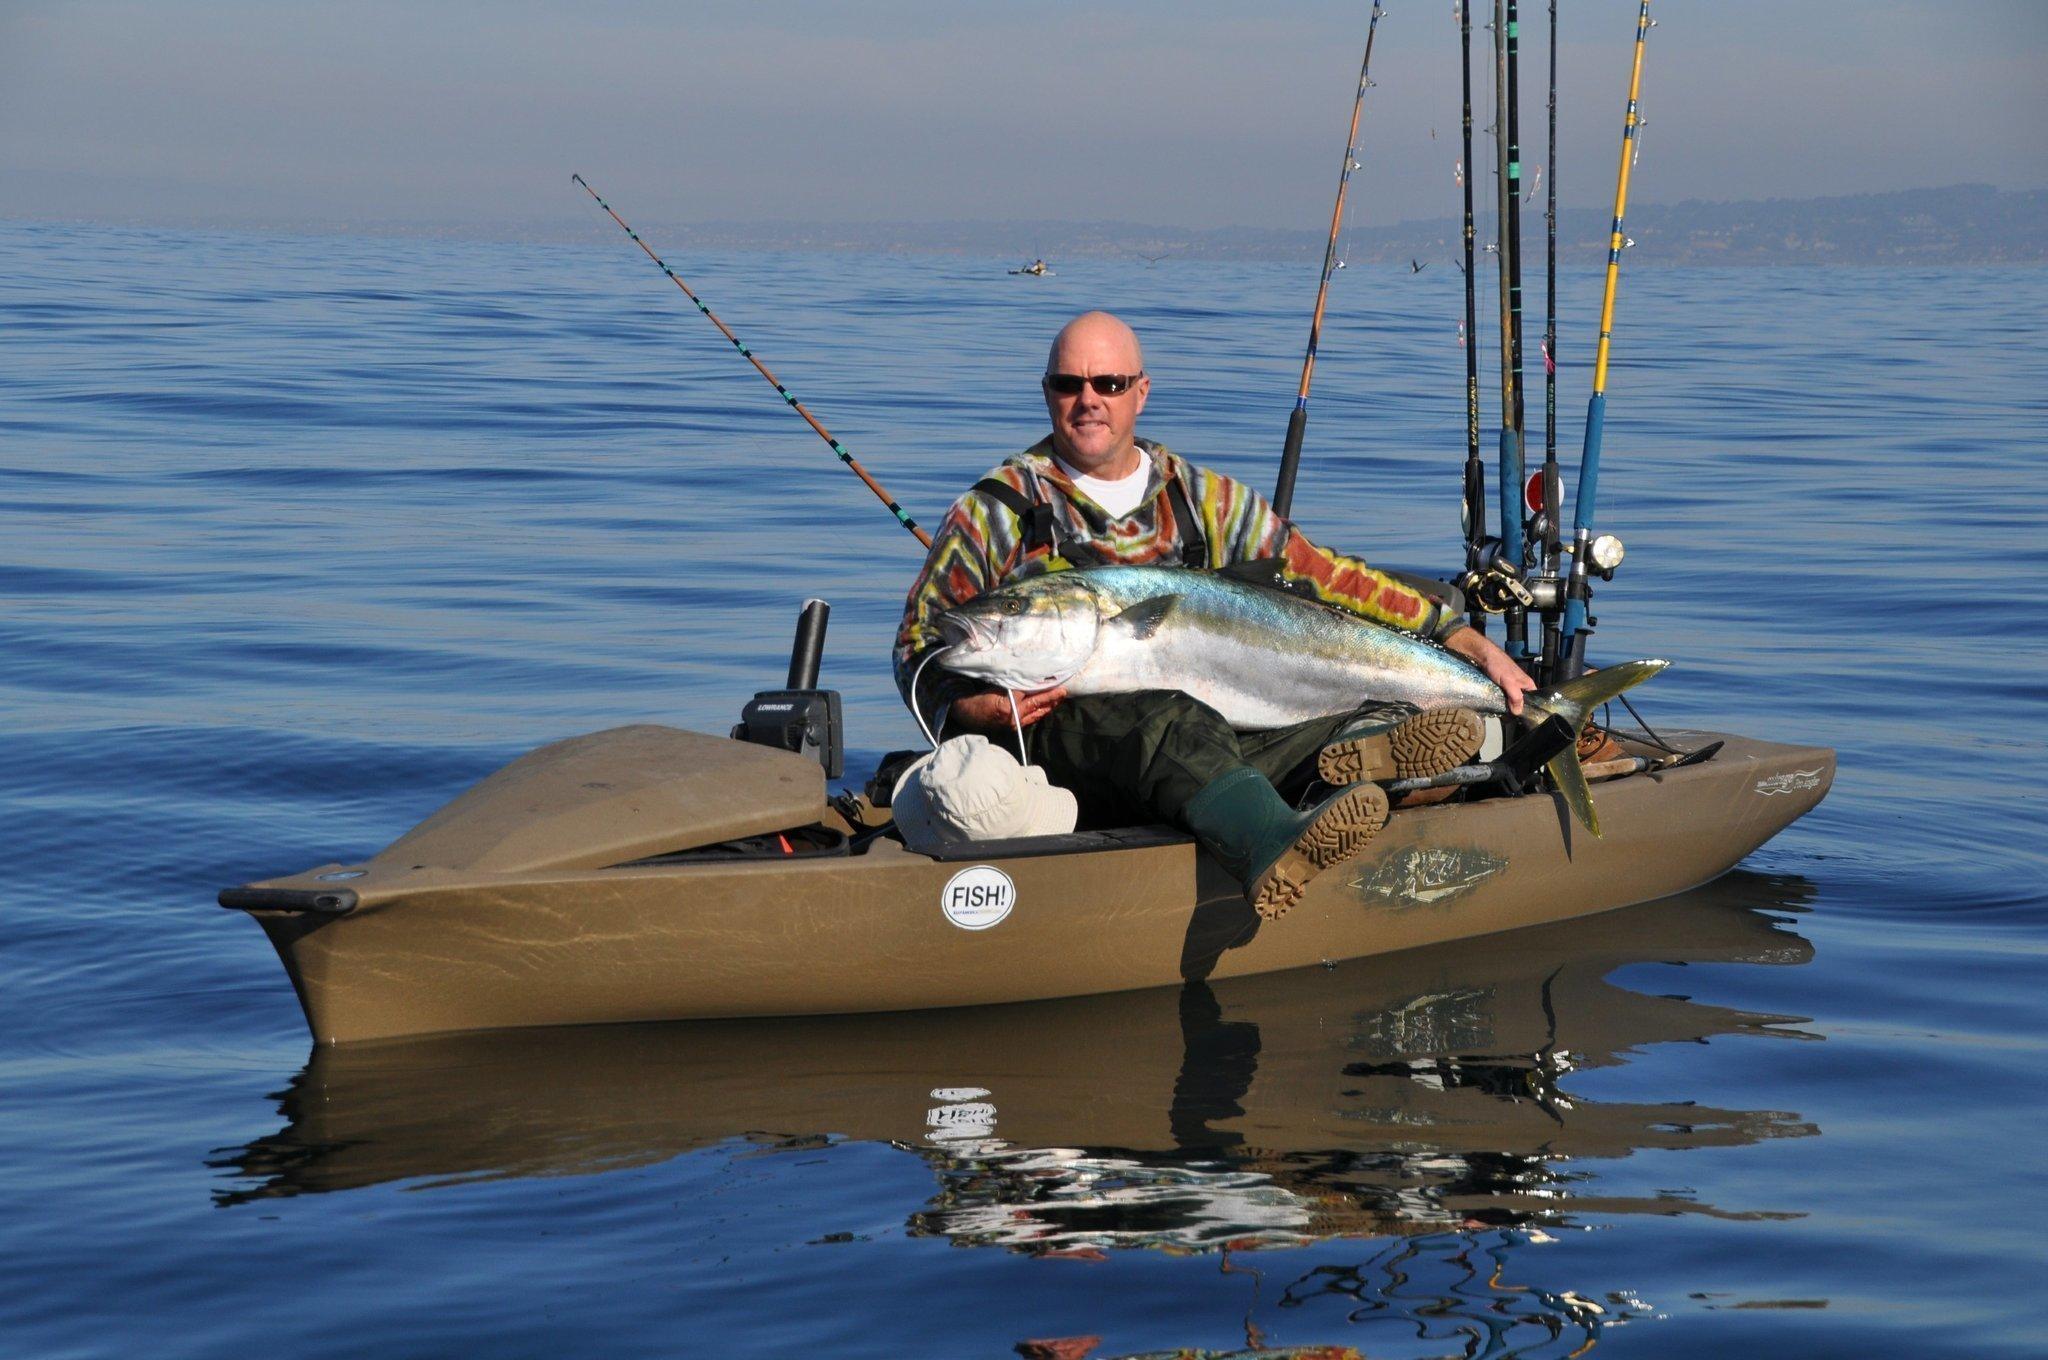 Kayak angler lands giant yellowtail off la jolla the san for La jolla fishing